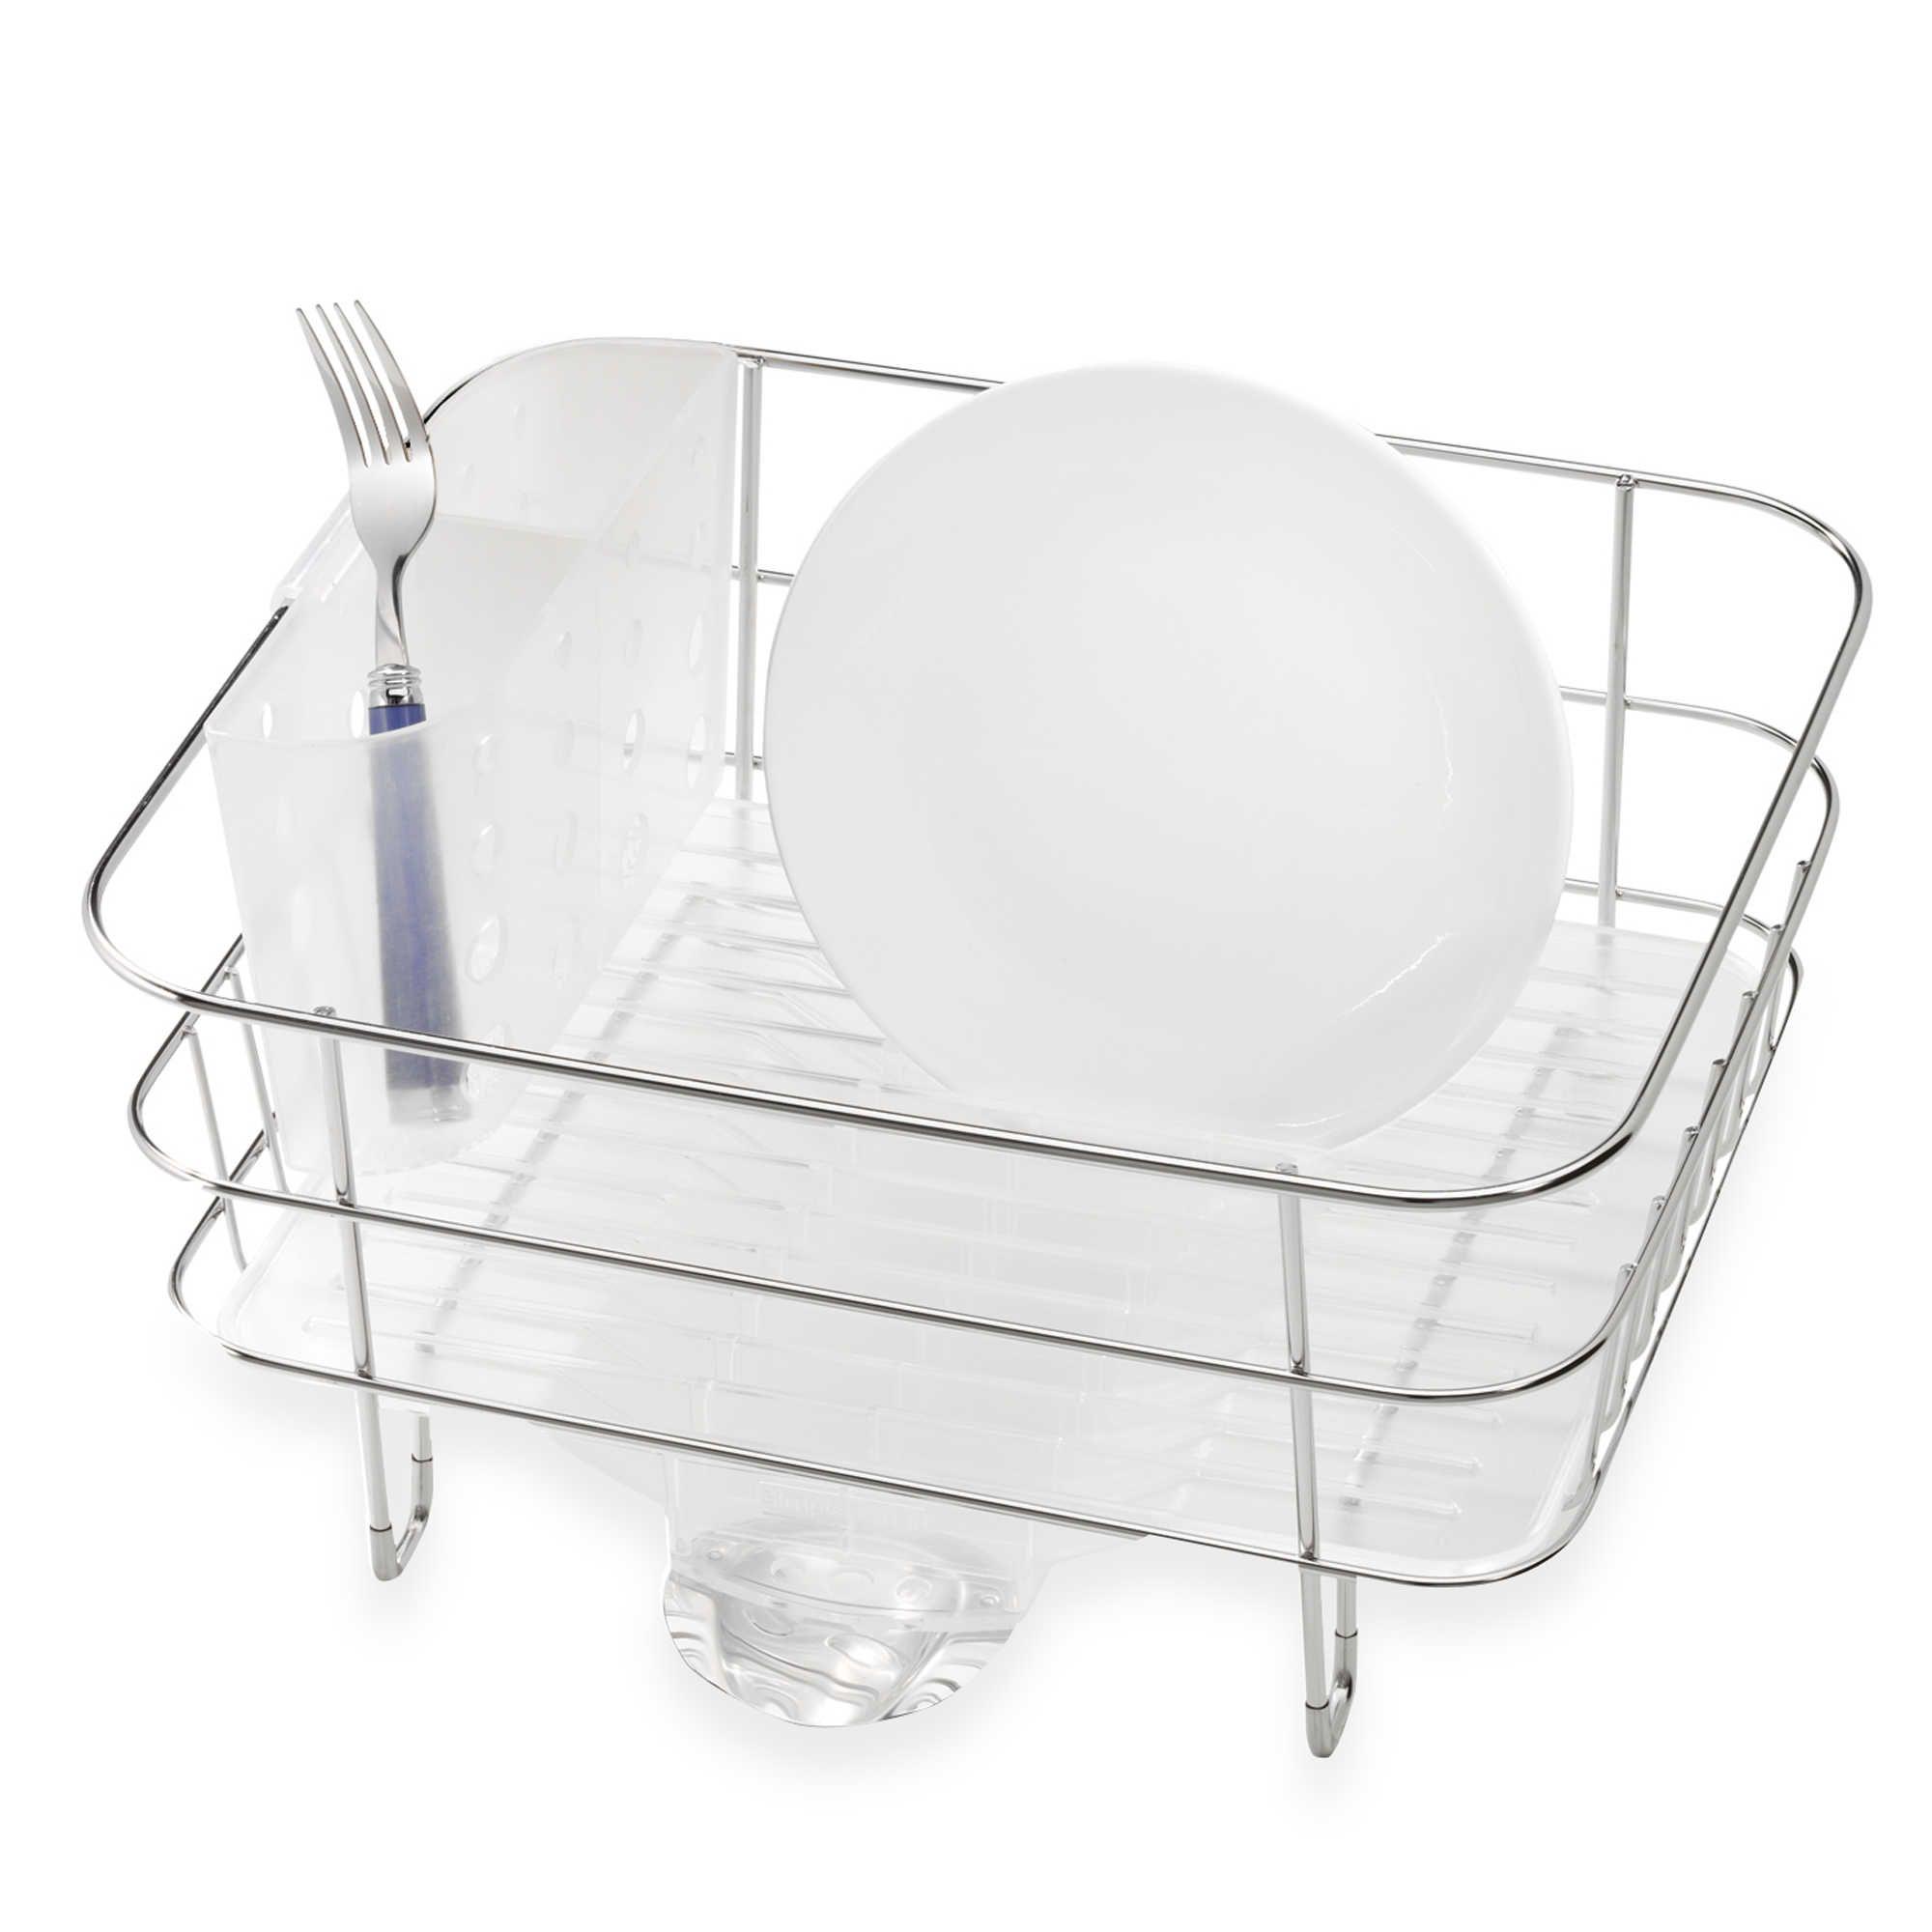 Best Simplehuman® Compact Stainless Steel Dish Rack Casitas 400 x 300